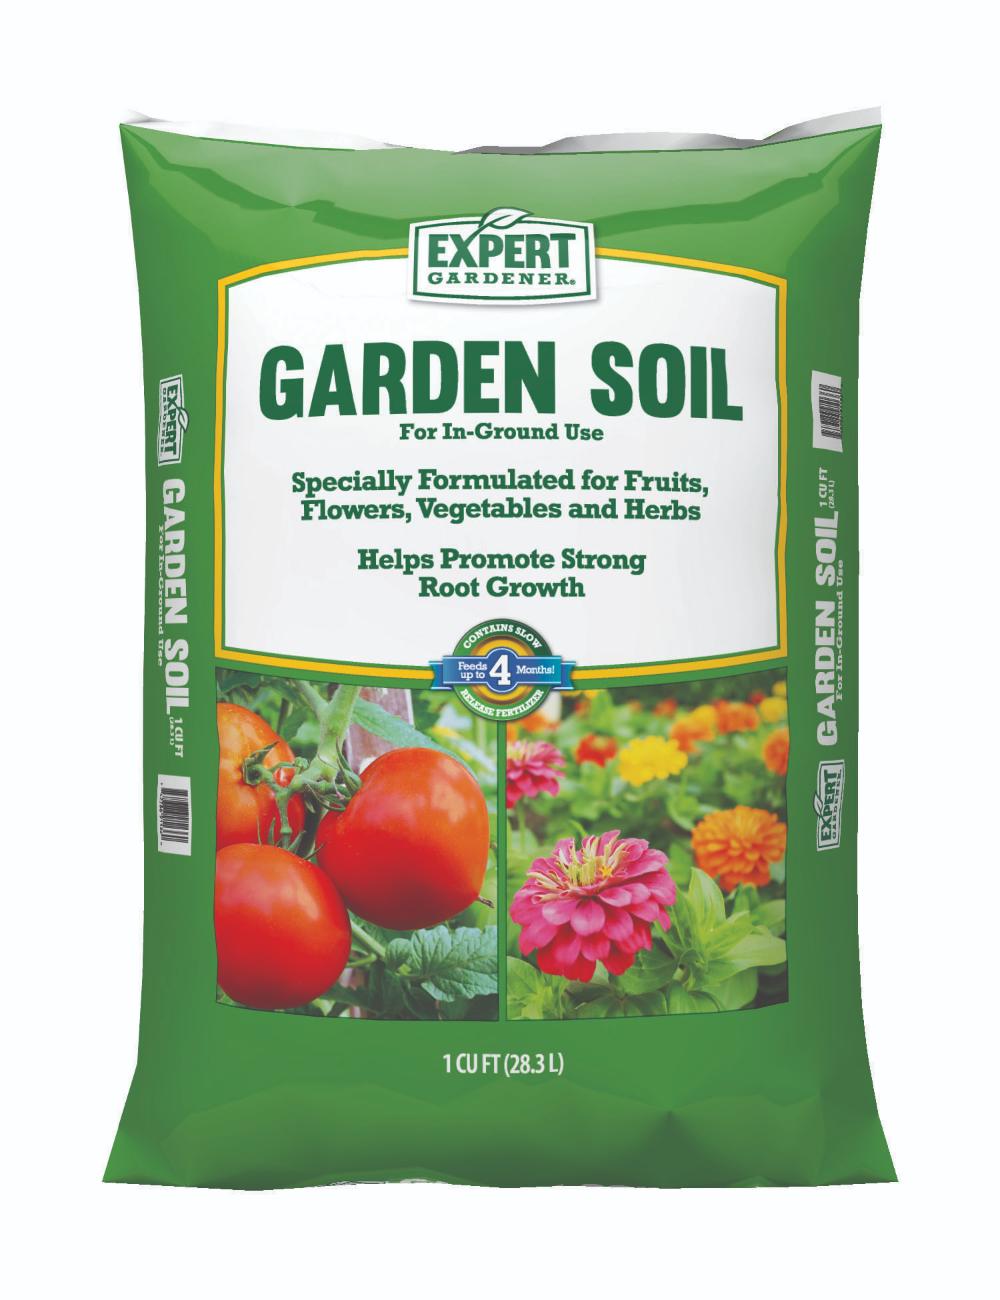 Free 2 Day Shipping Buy Expert Gardener Garden Soil 1cf At Walmart Com Garden Soil Garden Help Soil